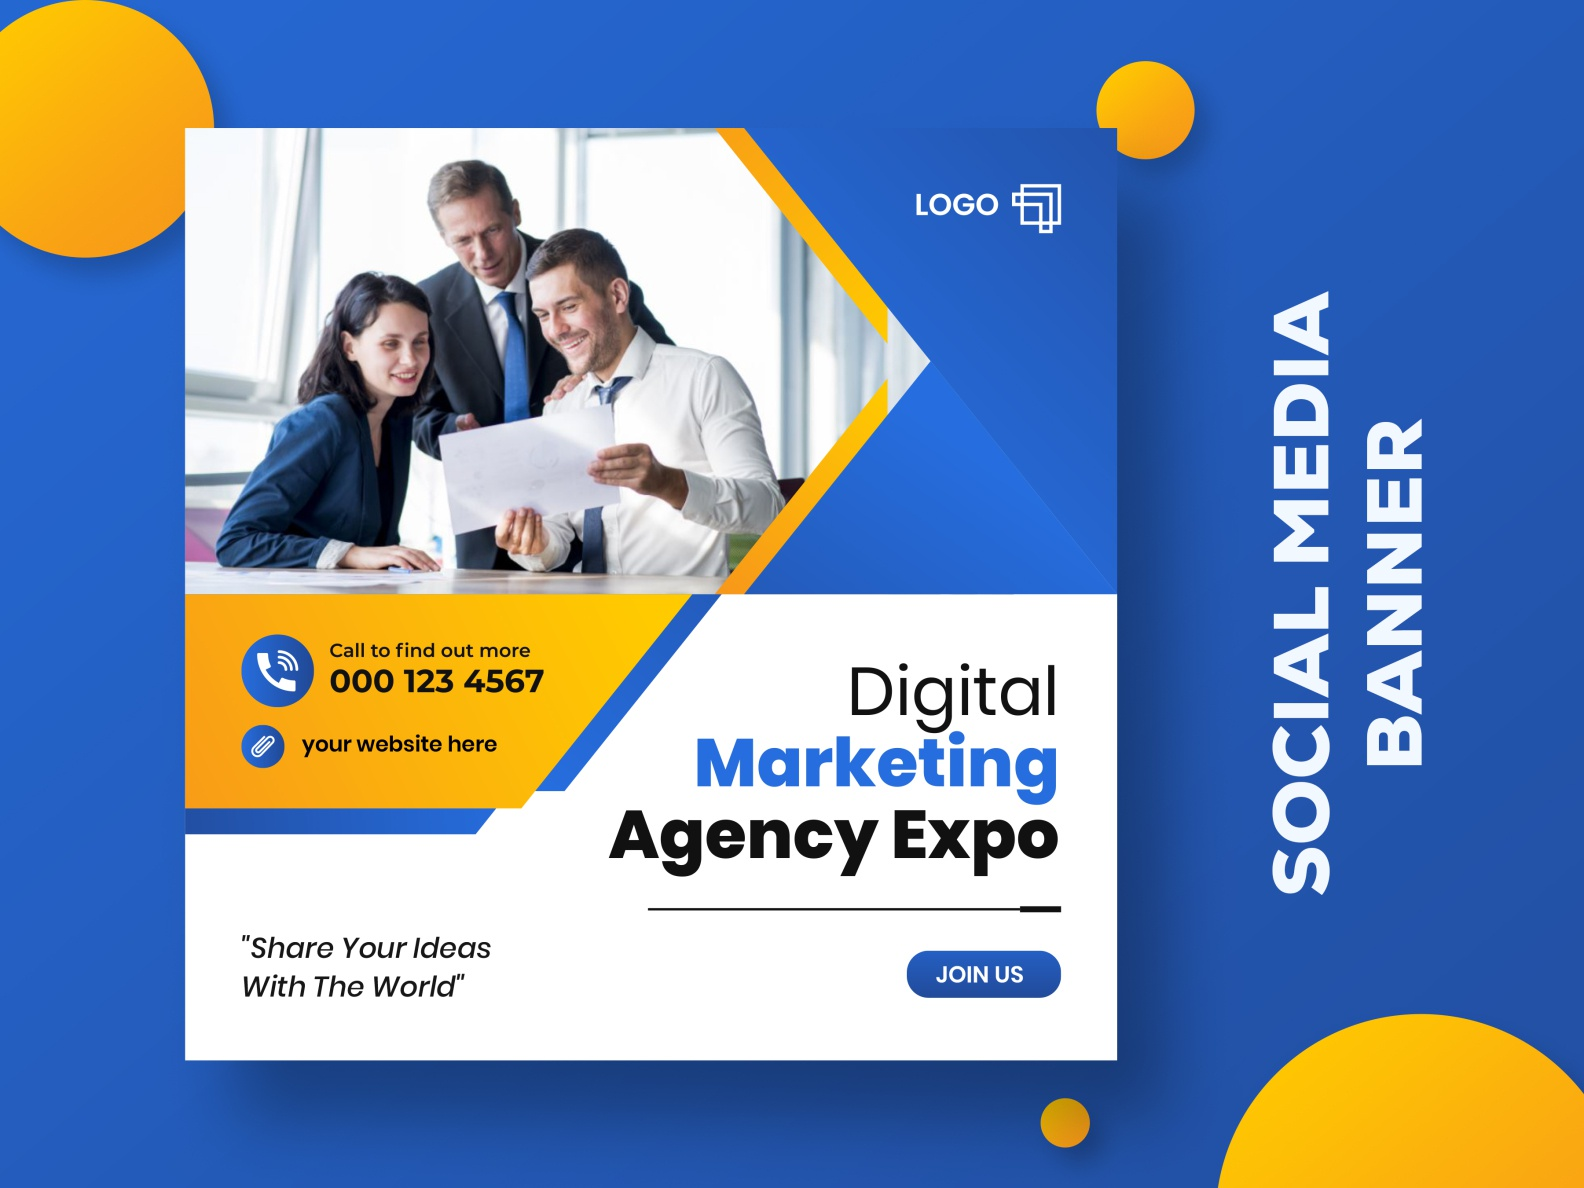 Digital marketing agency Social media banner ads template by Shuvojit  Sarker on Dribbble